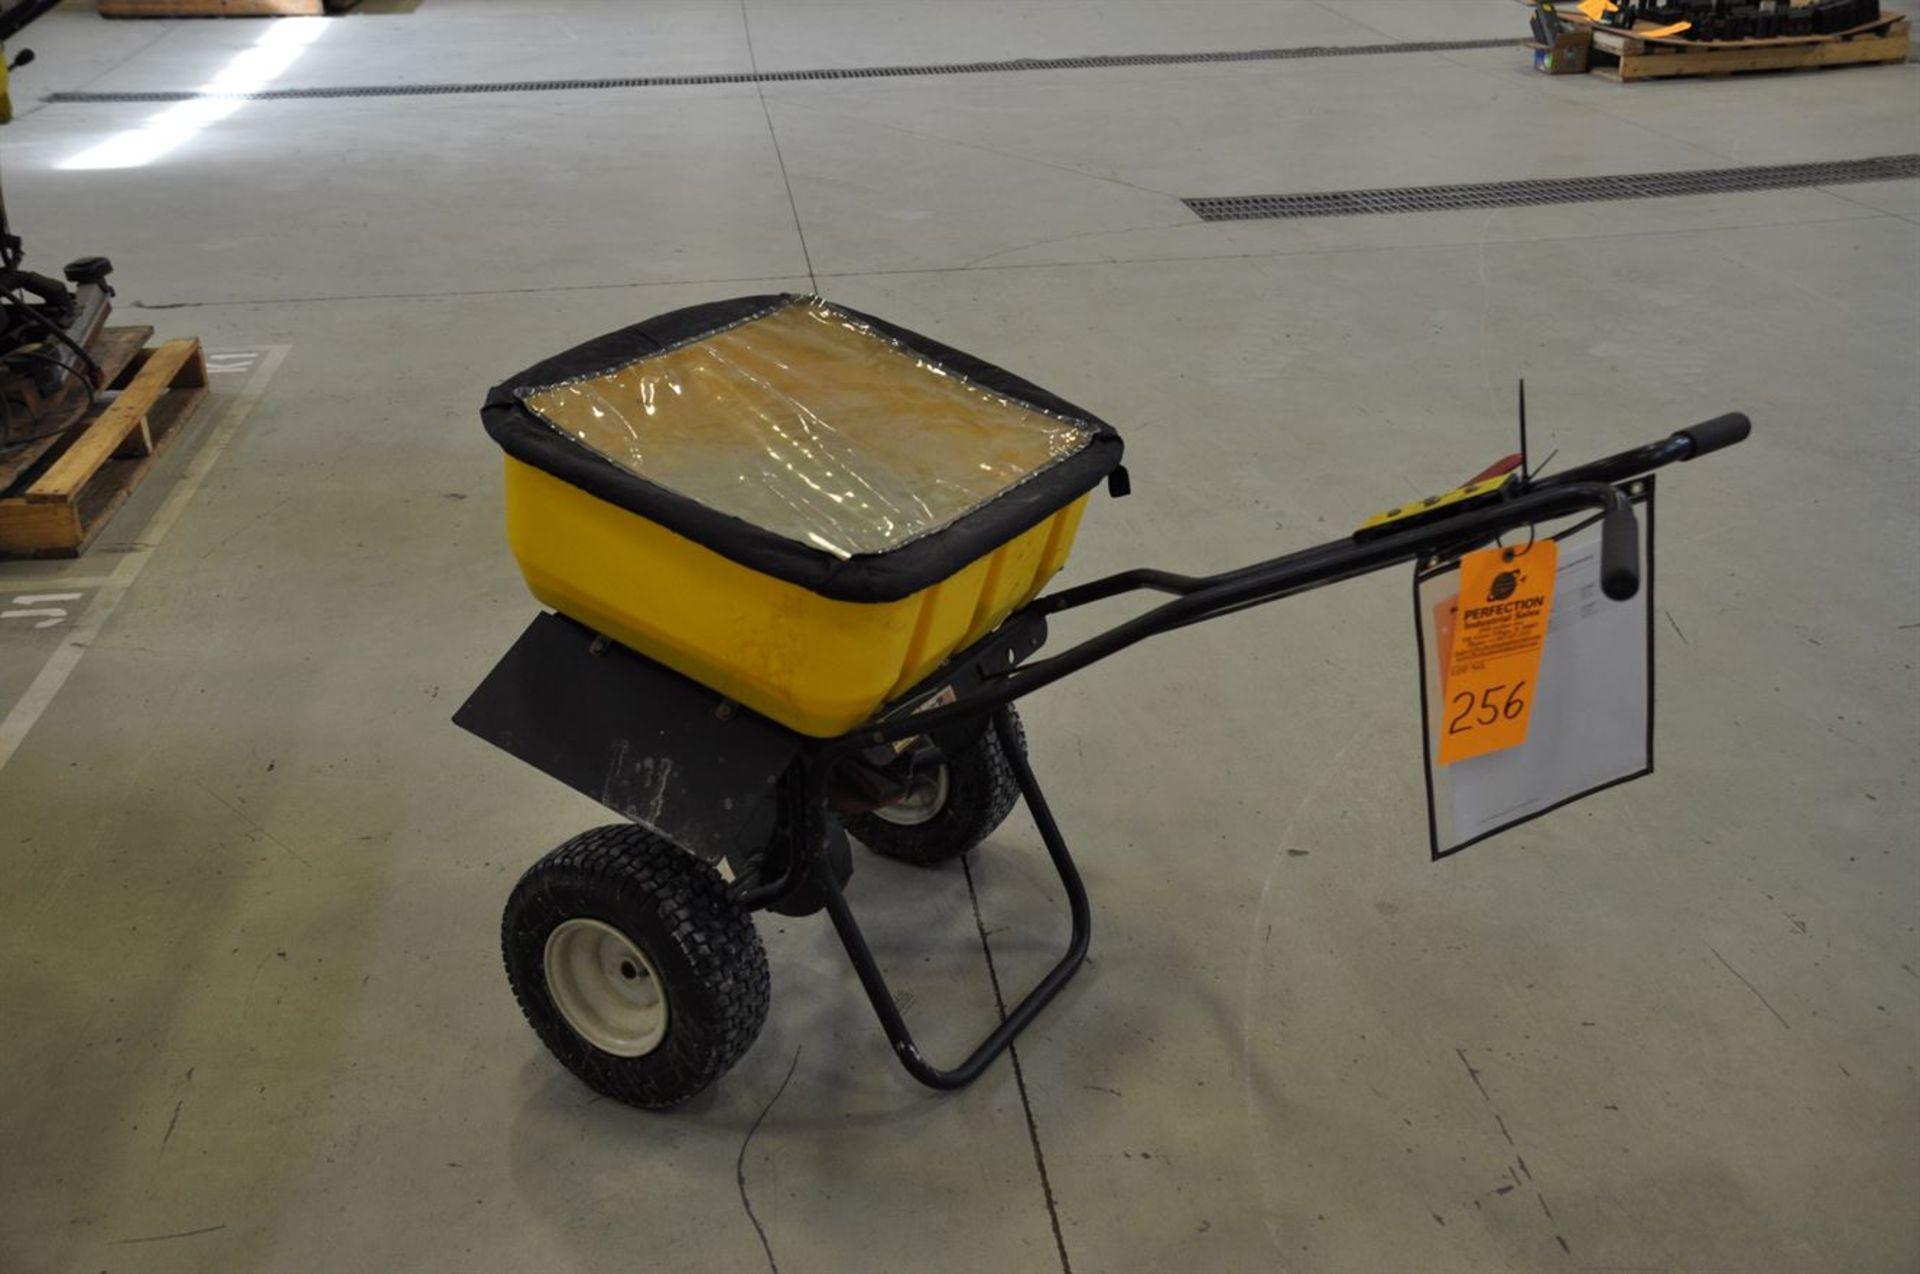 SnowEx Salt Spreader, 160 lb capacity w/ 4 bags ice melter